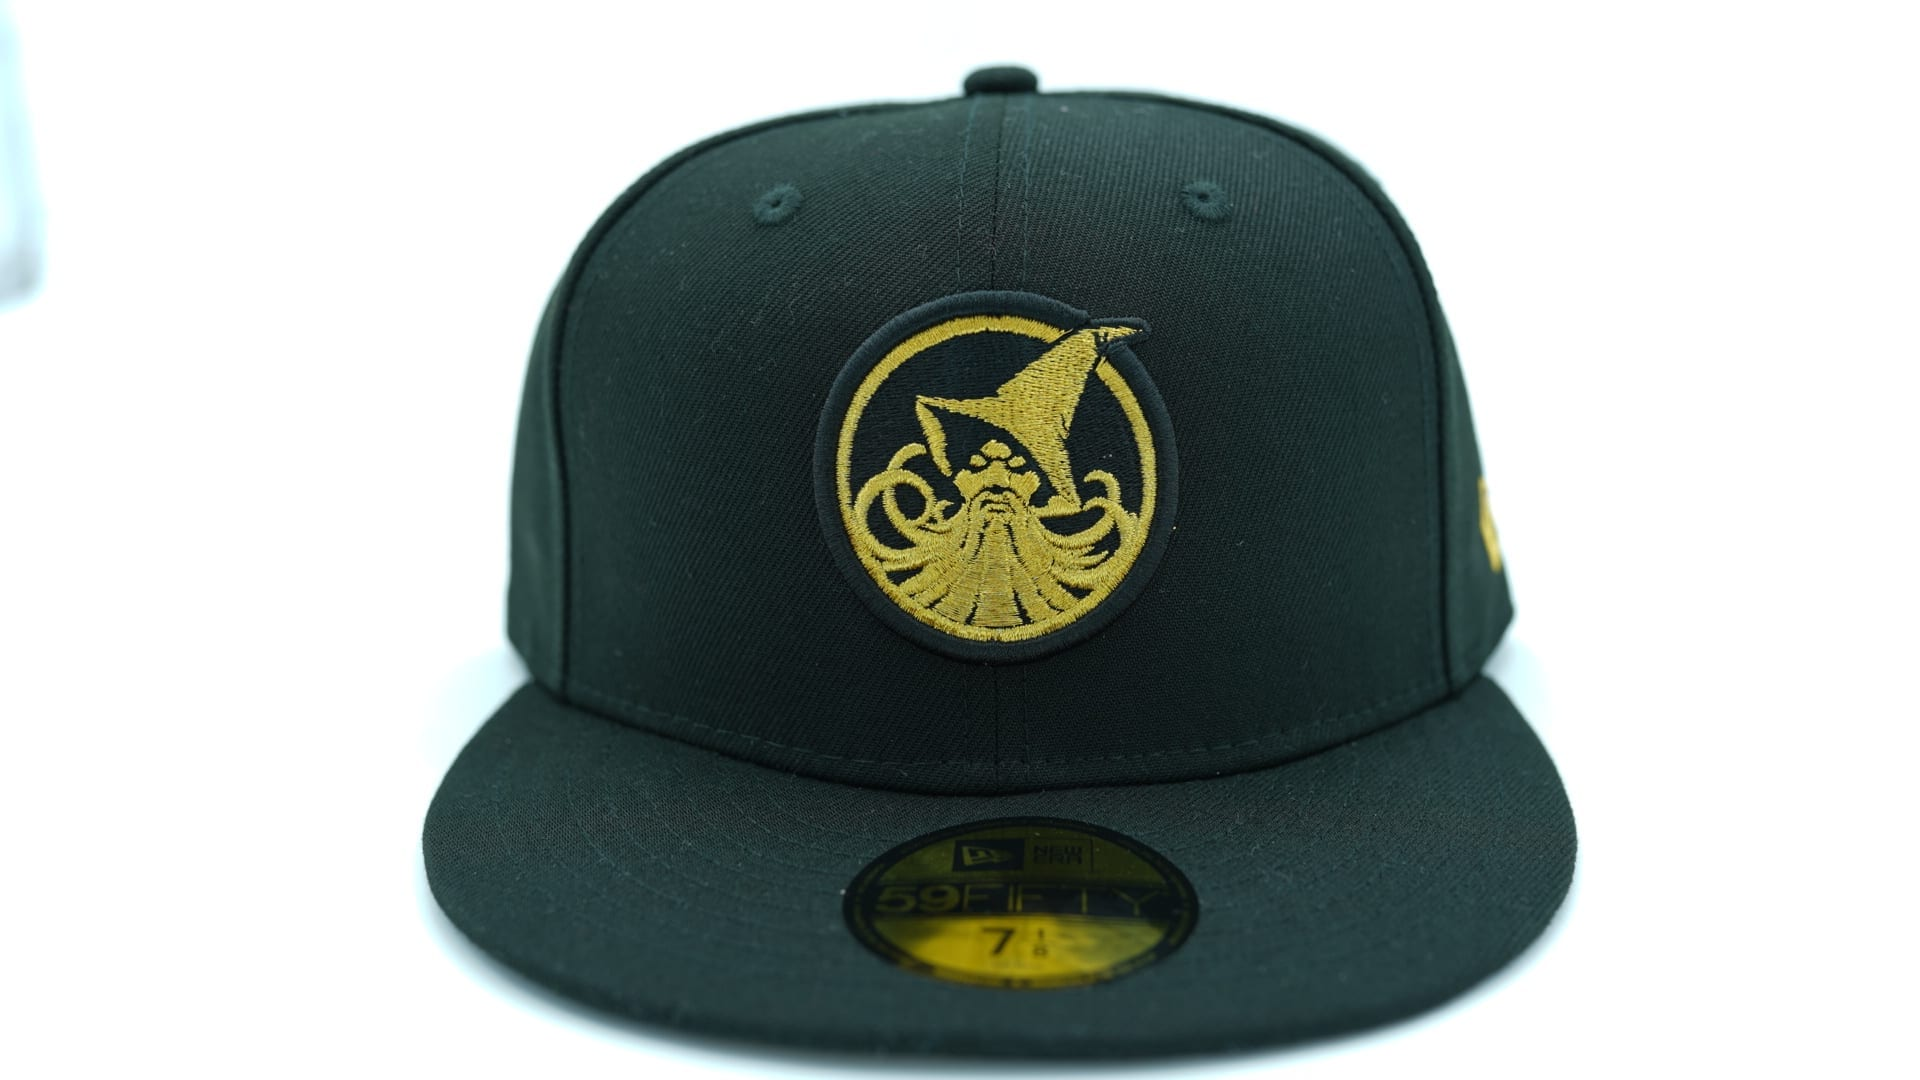 New-Era-x-NBA-Celtics-league-basic-fitted-cap-1-web